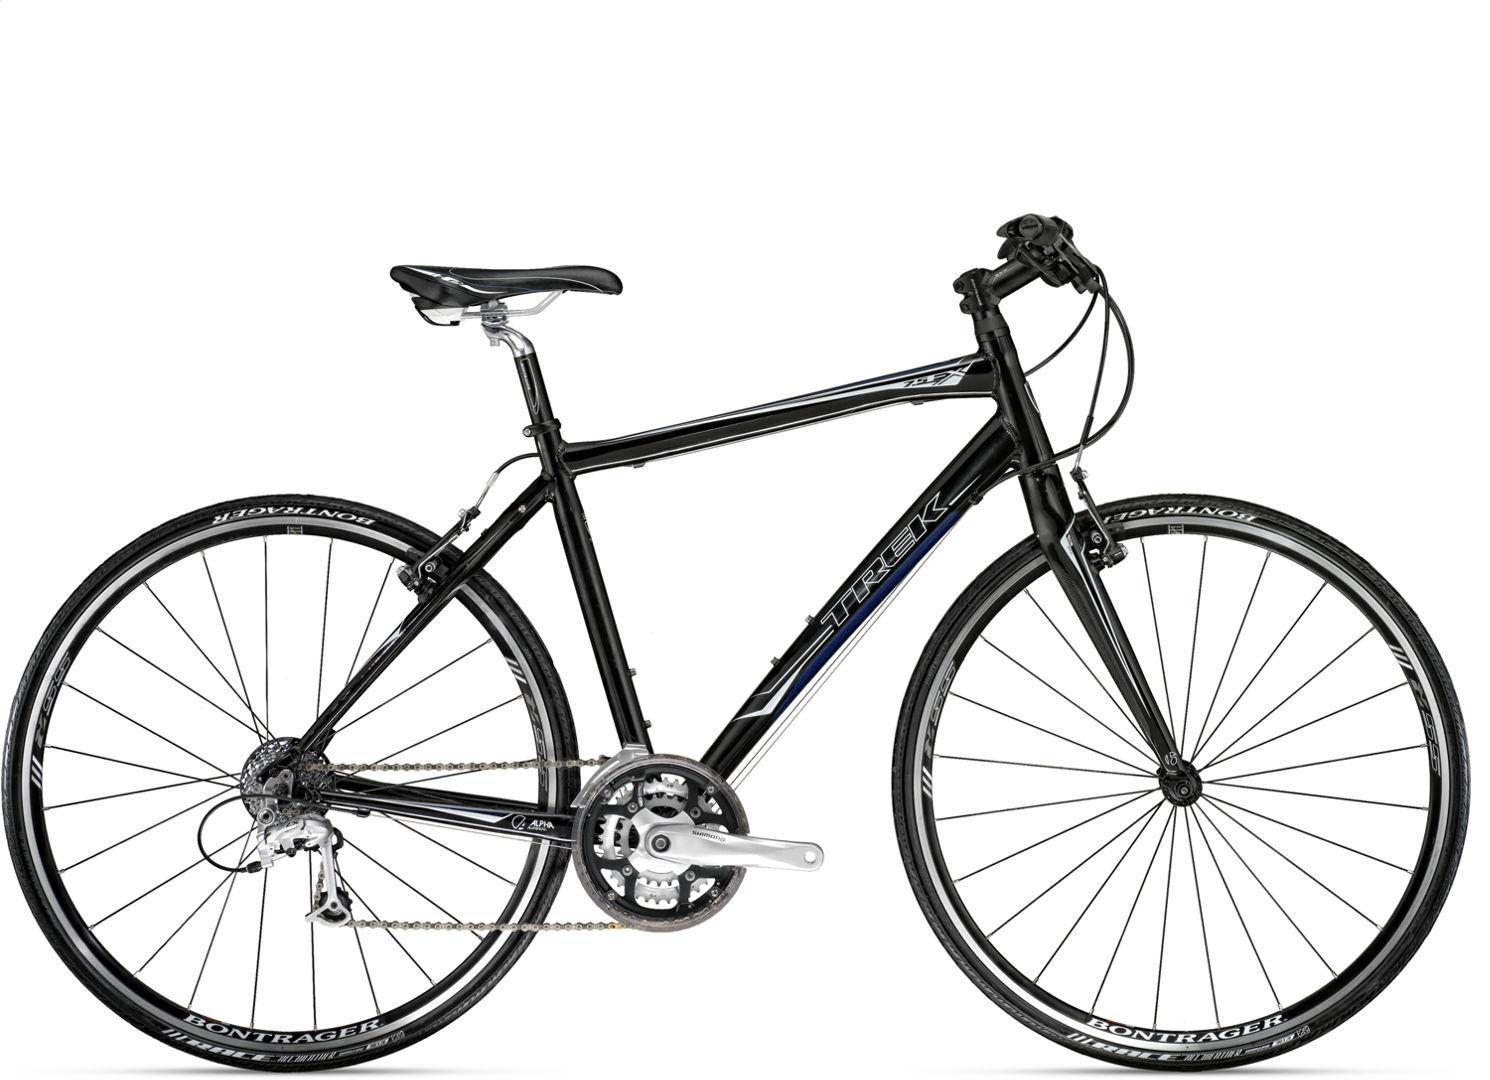 1490x1080 Road Bike Clipart Clipart Kid 3